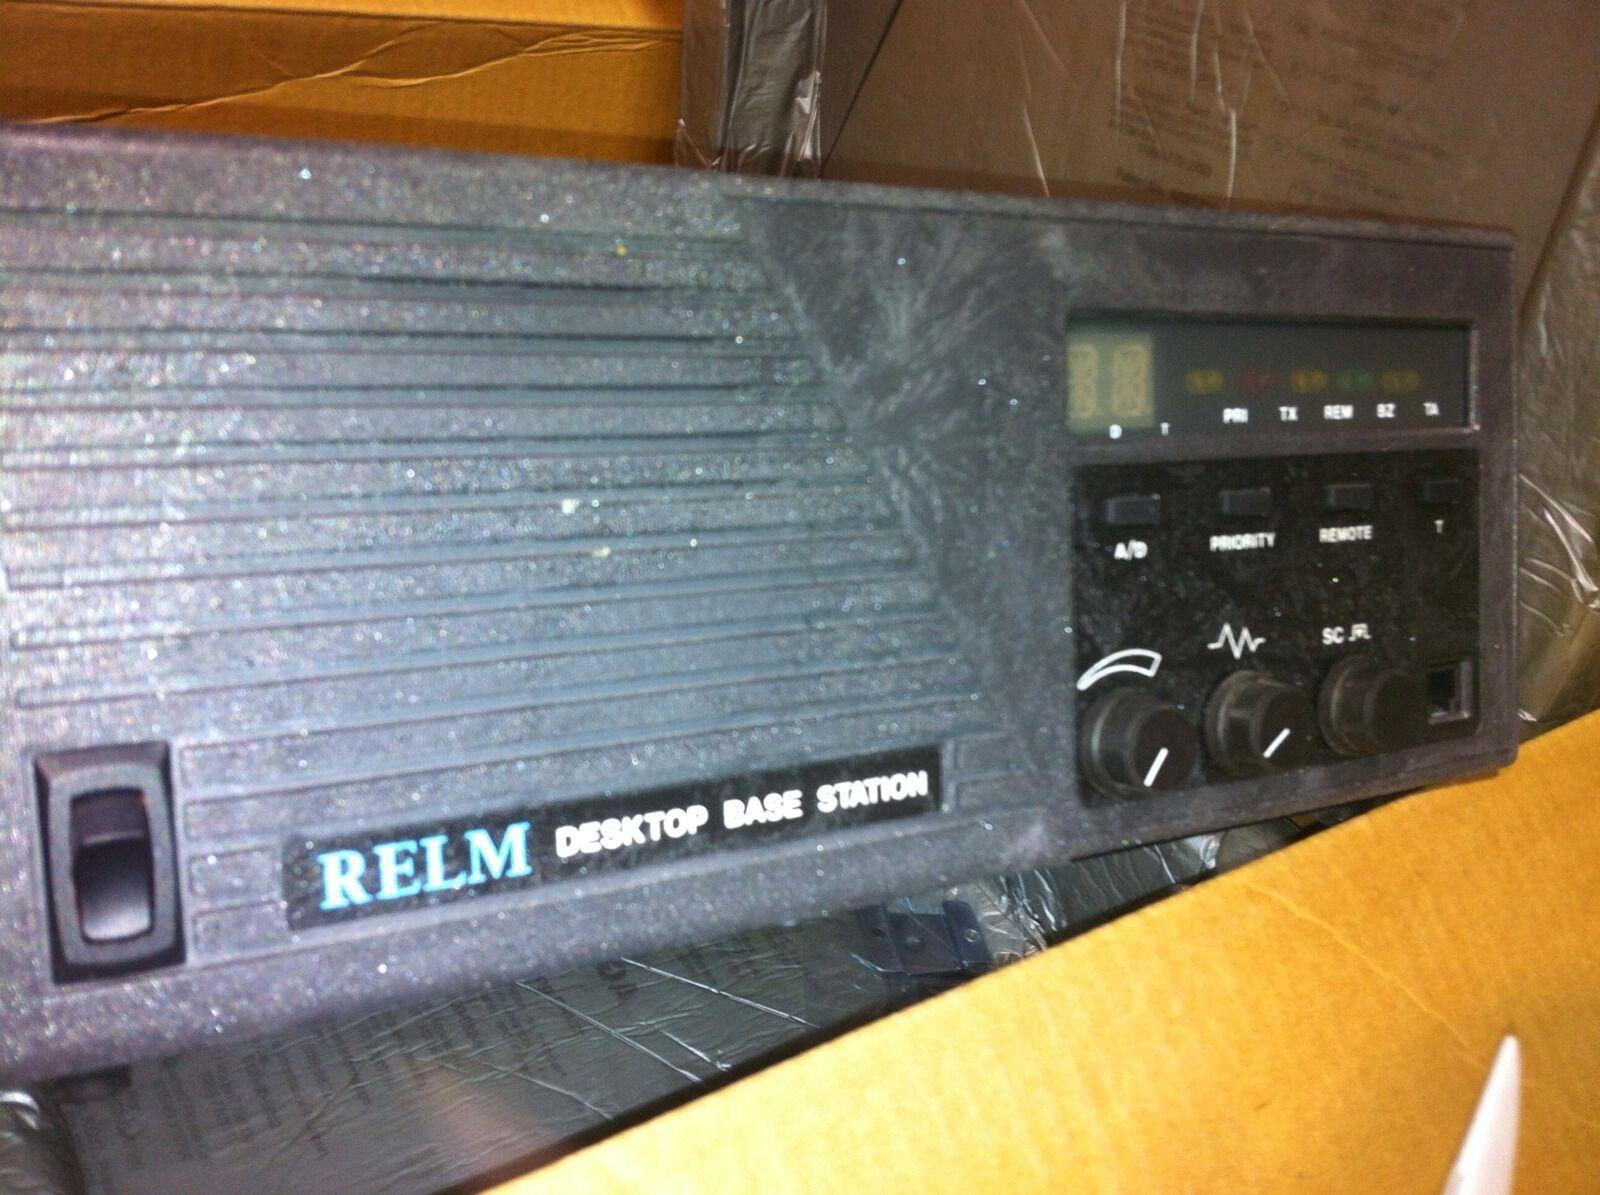 New desktop base station 25 watt gmrs 450 460 470 mhz for Radio boden 98 2 mhz